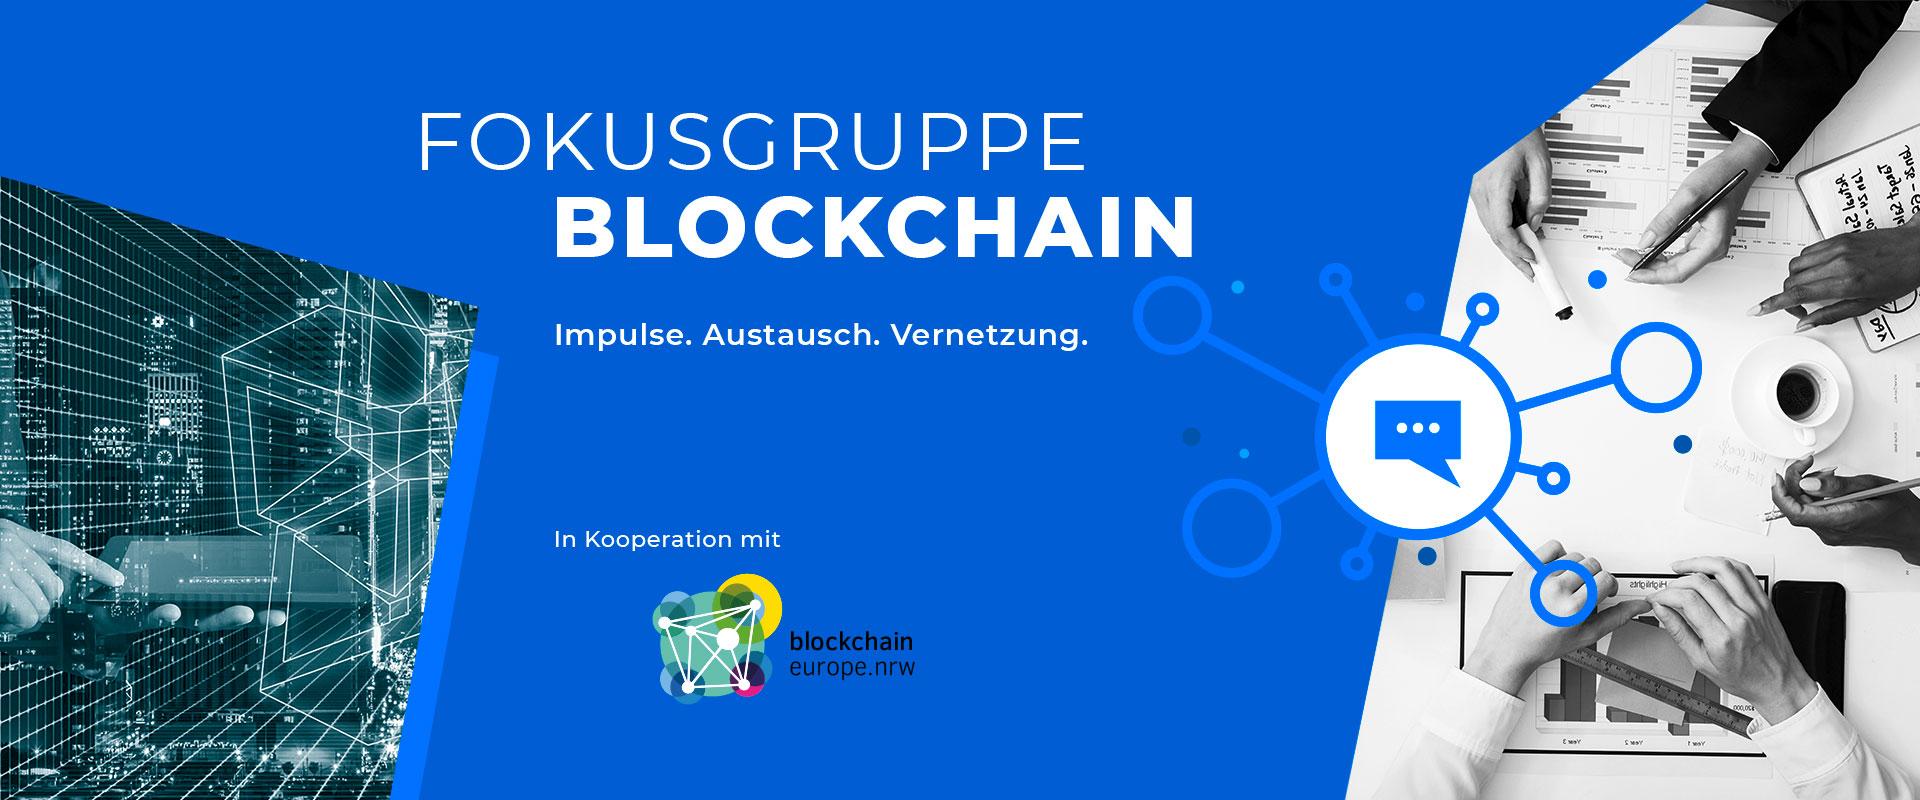 Fokusgruppen_Blockchain_Website